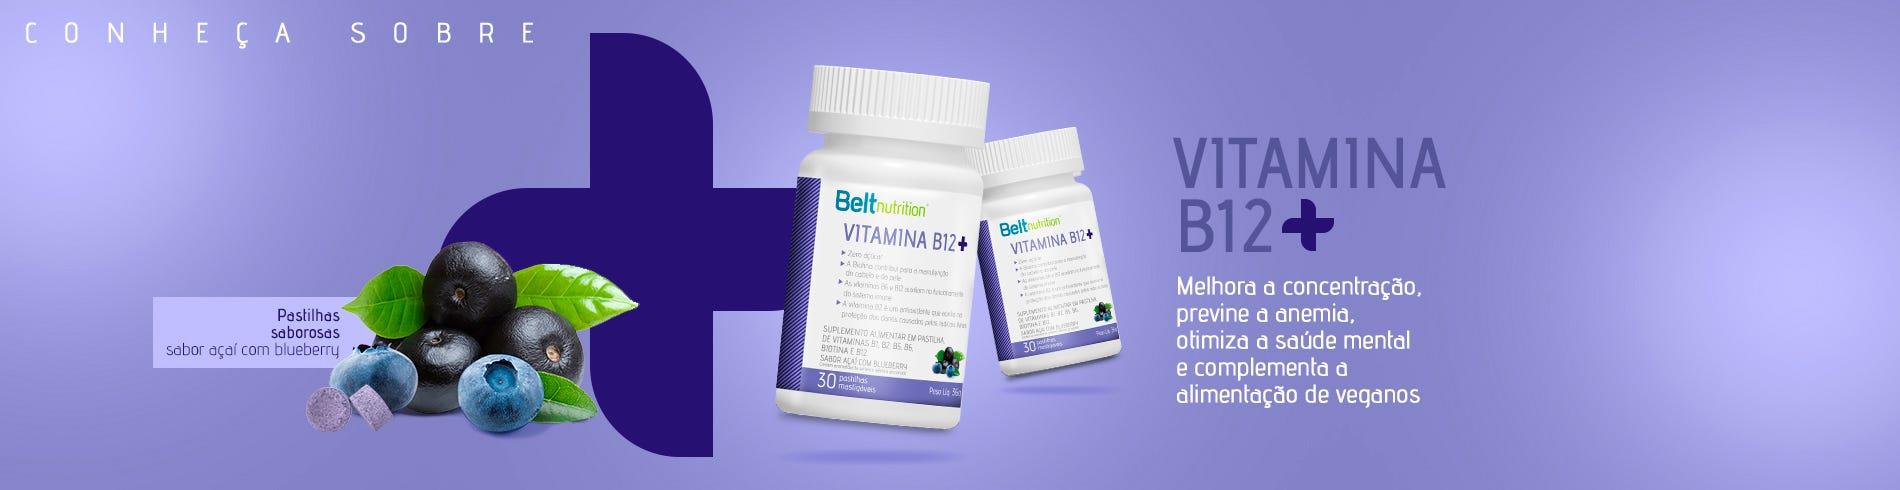 Vitamina B12 Pastilha Açaí